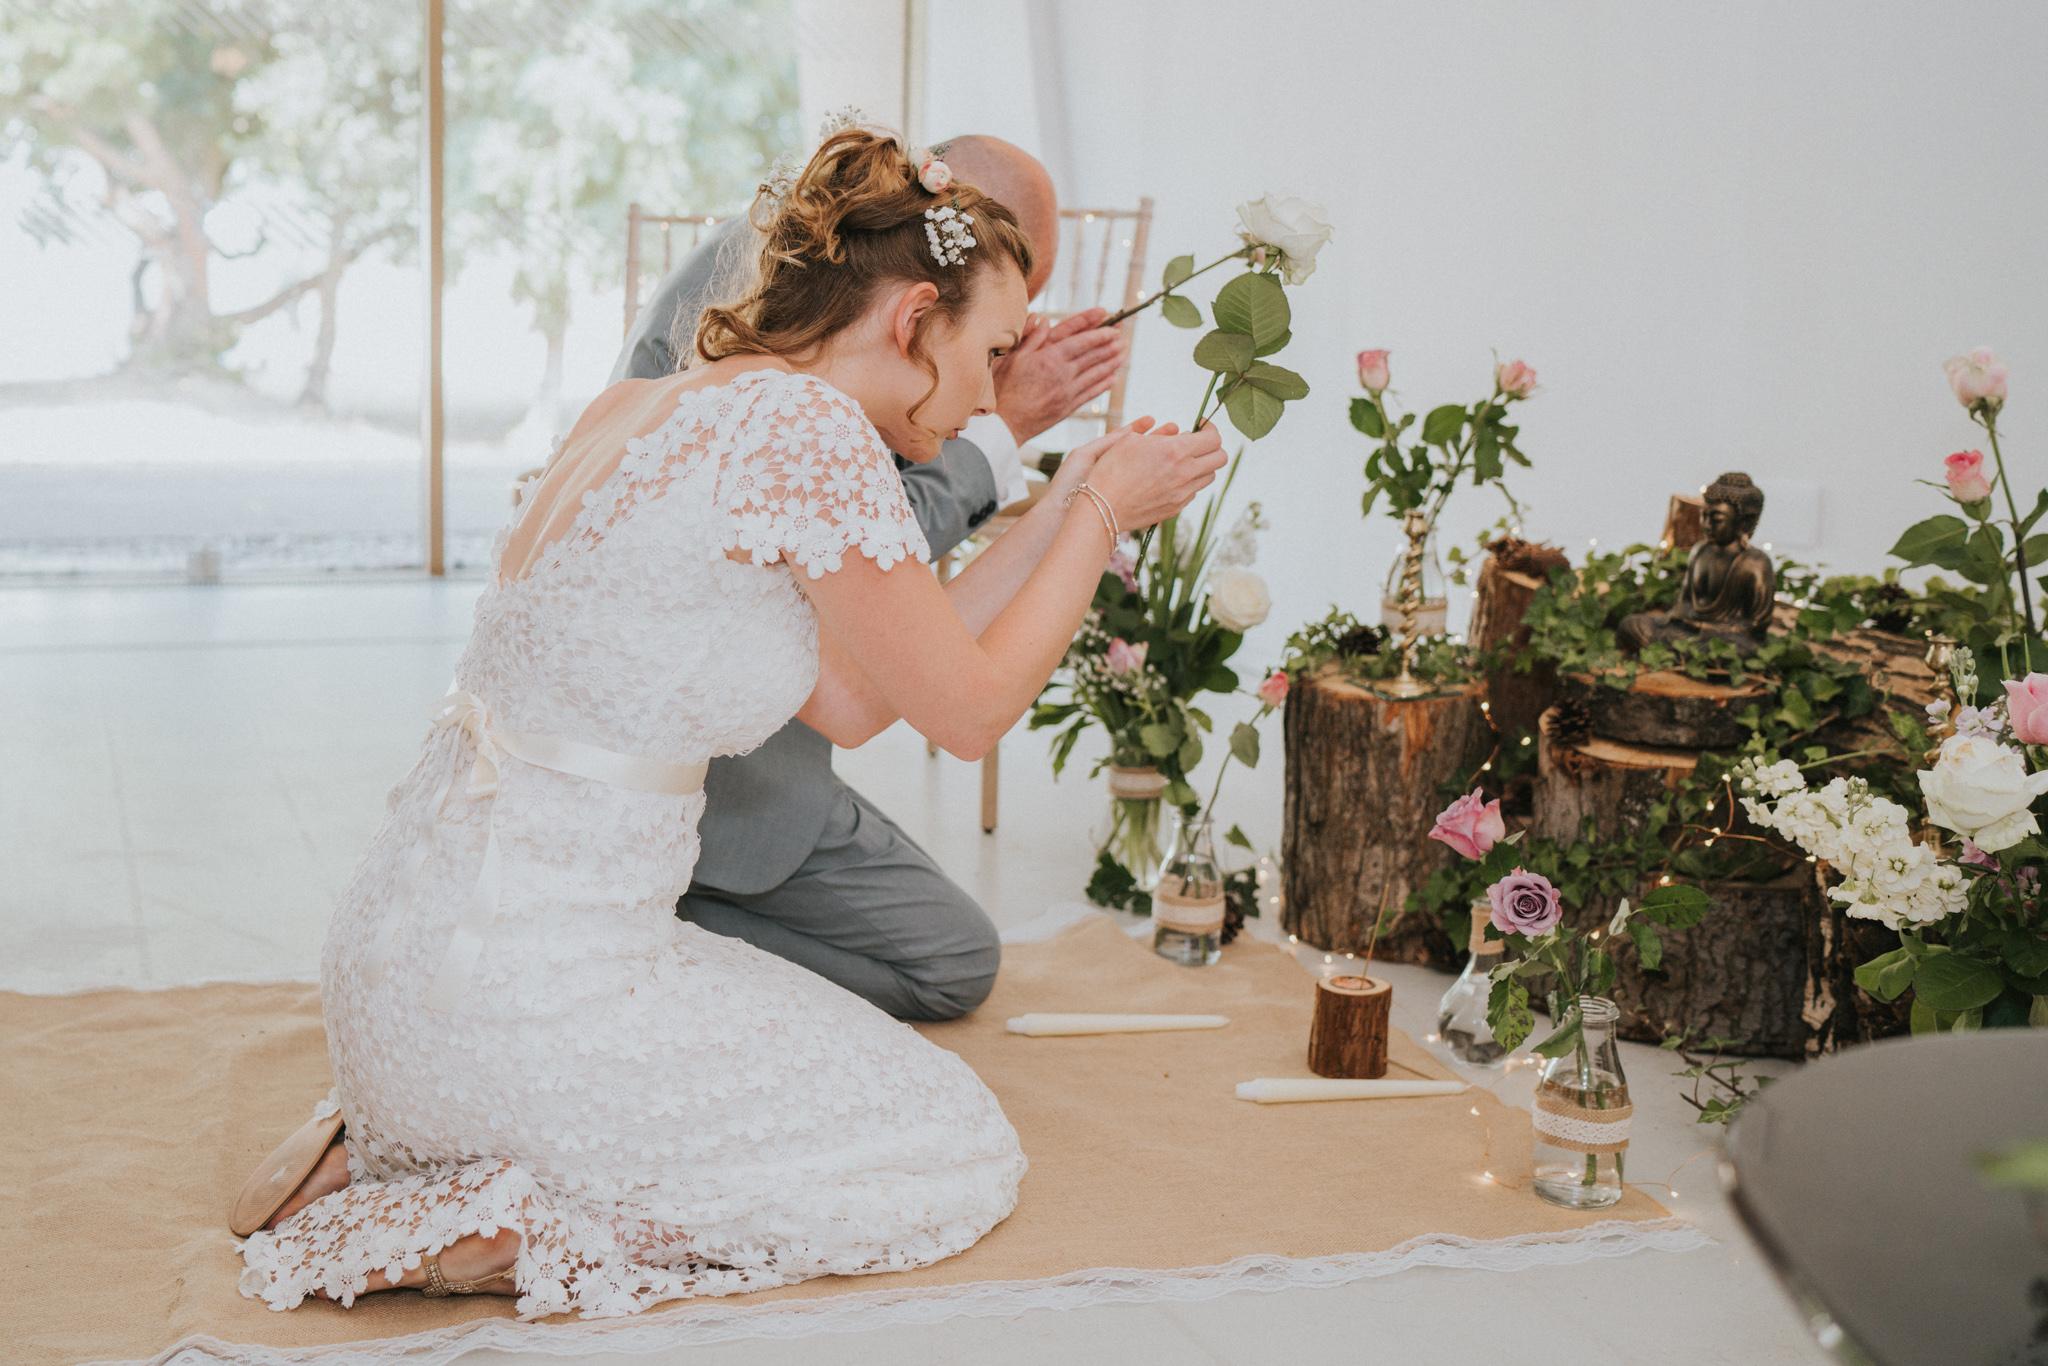 Georgie-Ketu-Firstsite-Wedding-Colchester-Essex-Grace-Elizabeth-Alternative-Wedding-Photographer (10 of 20).jpg